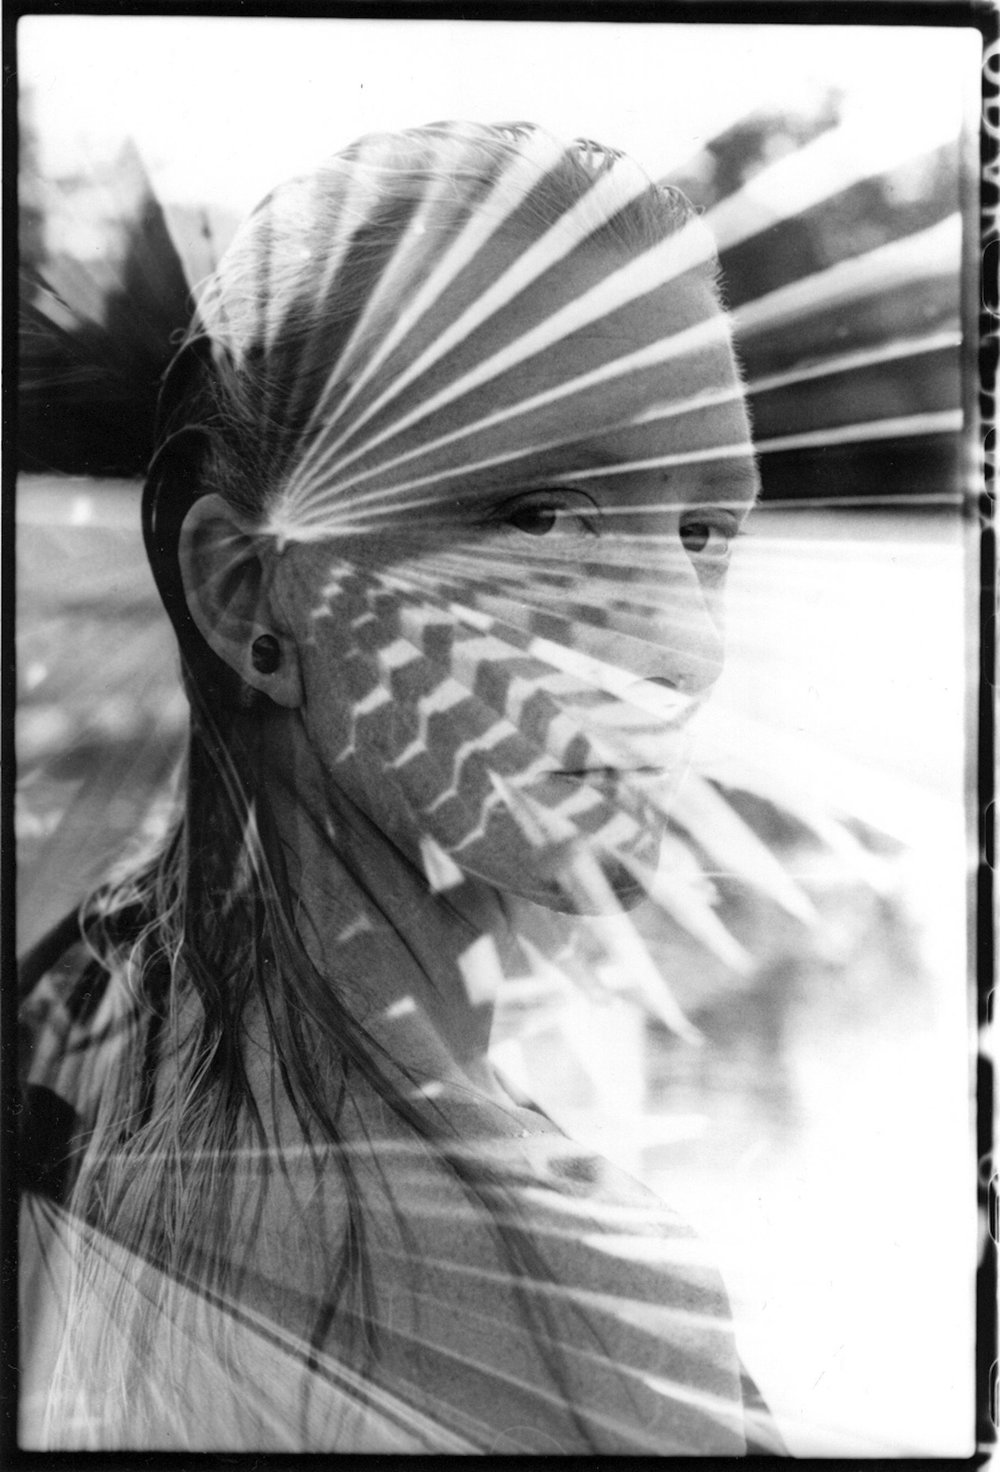 Palm Princes, Layered Negatives, Silver Gelatin Print